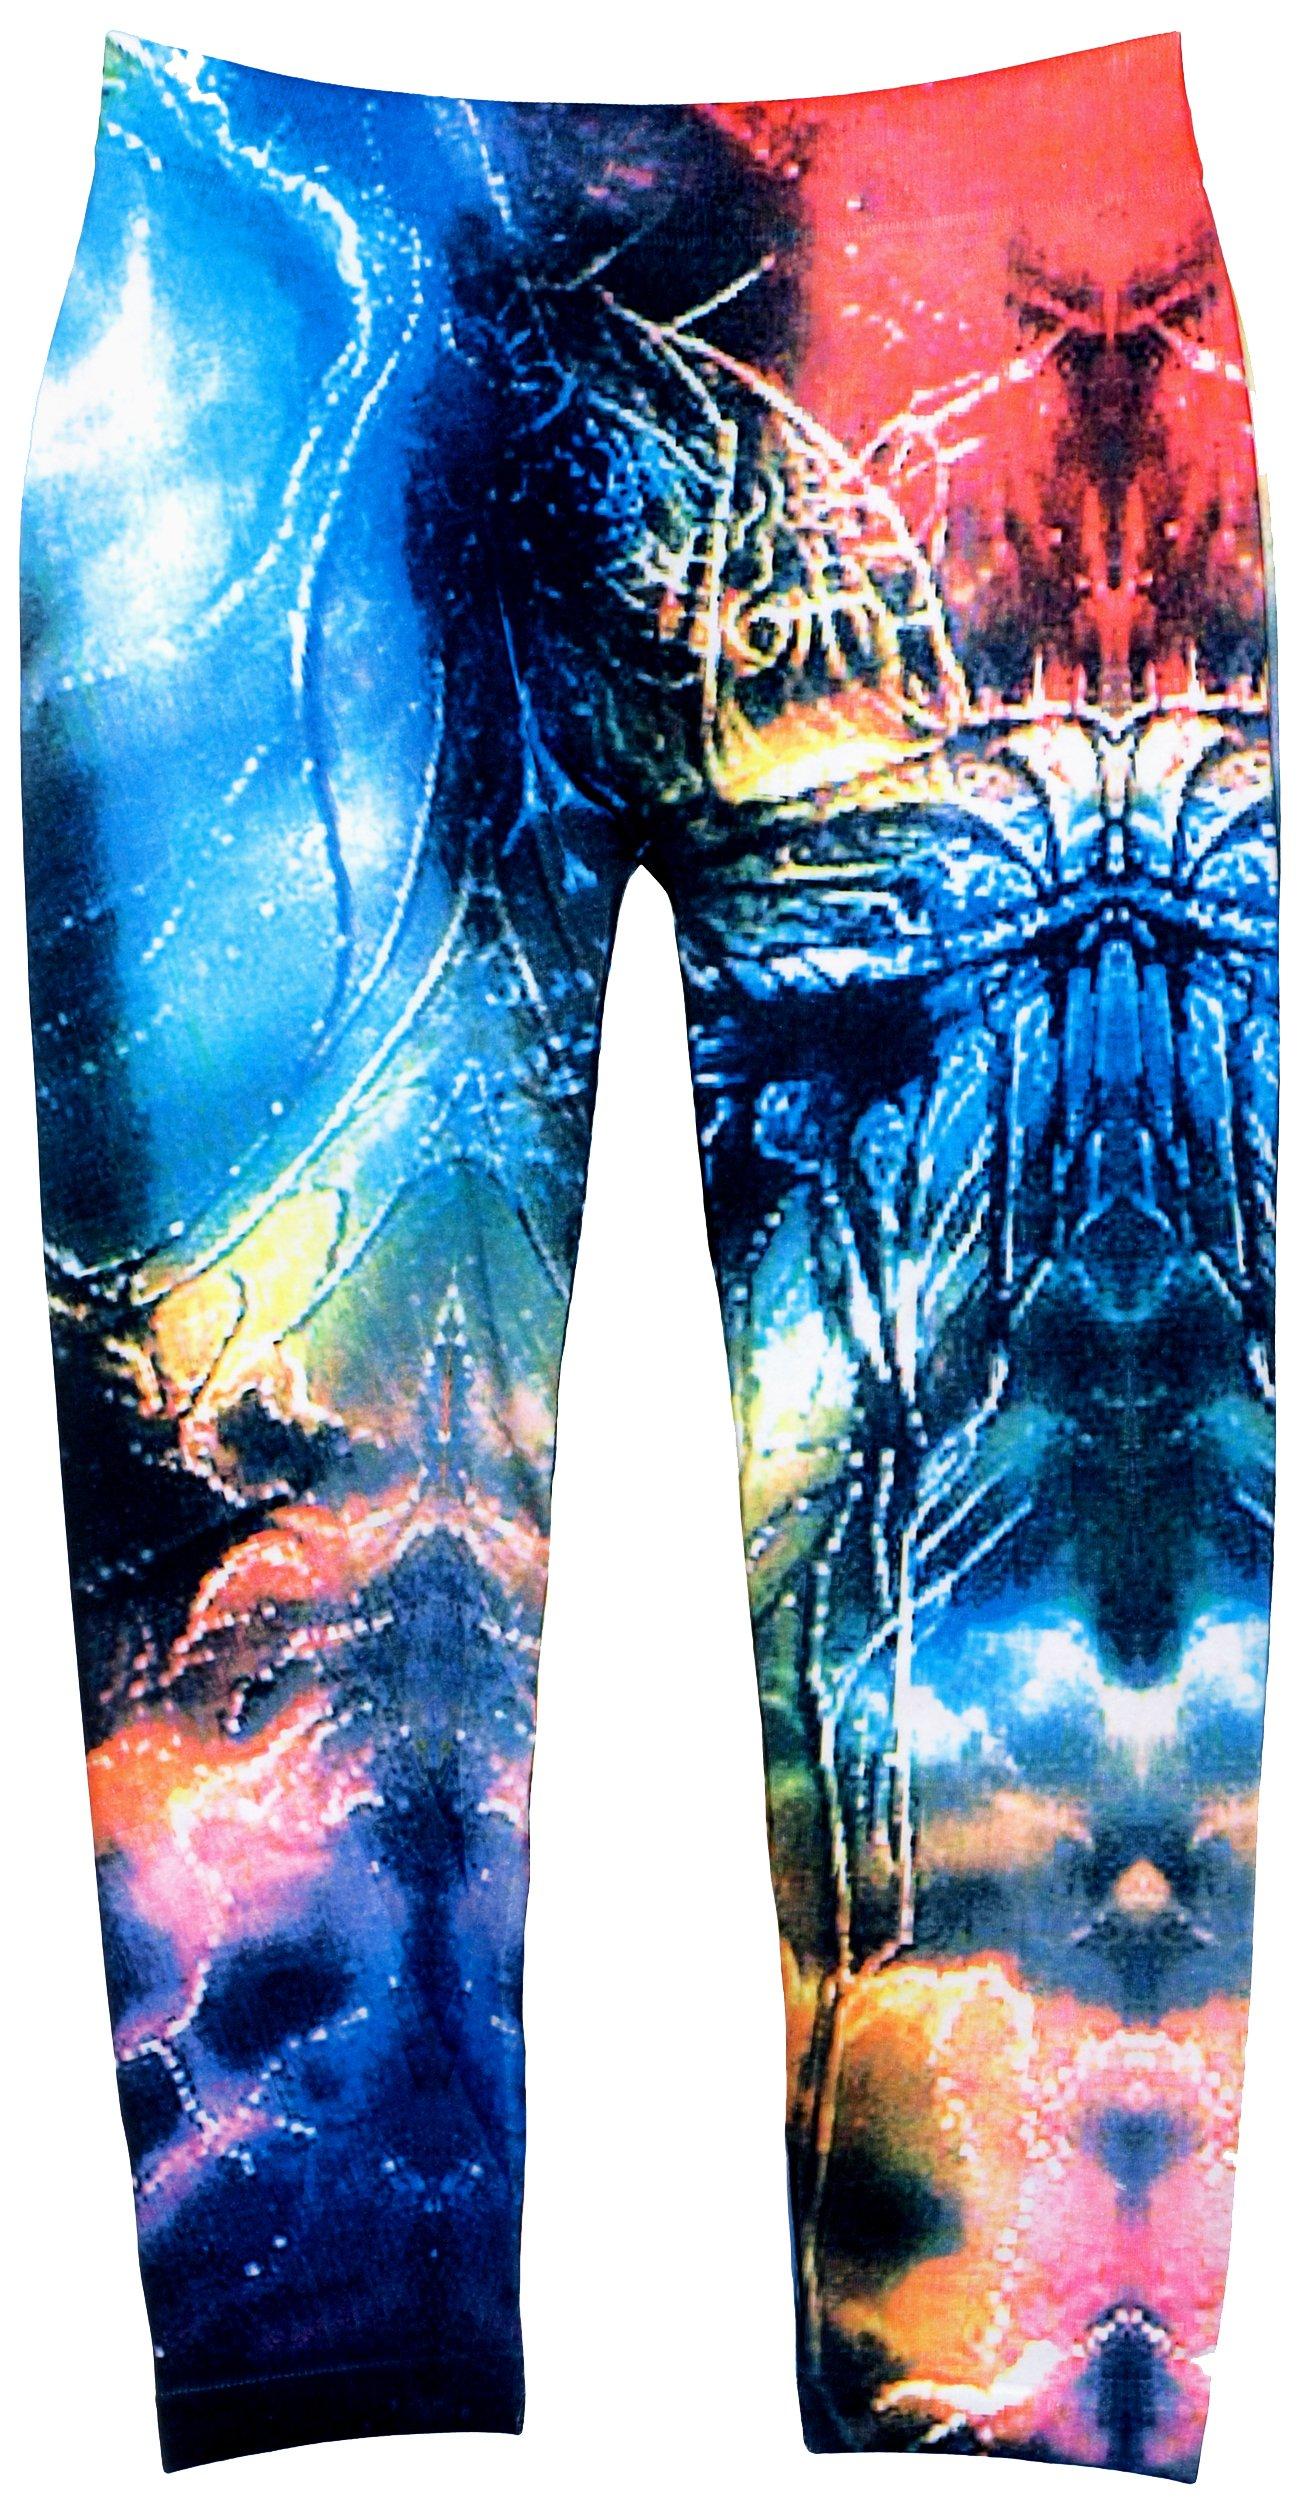 Crush Galaxy Girls Toddler & Youth Printed Leggings in Blue Black (2T-4T, Black-Blue)